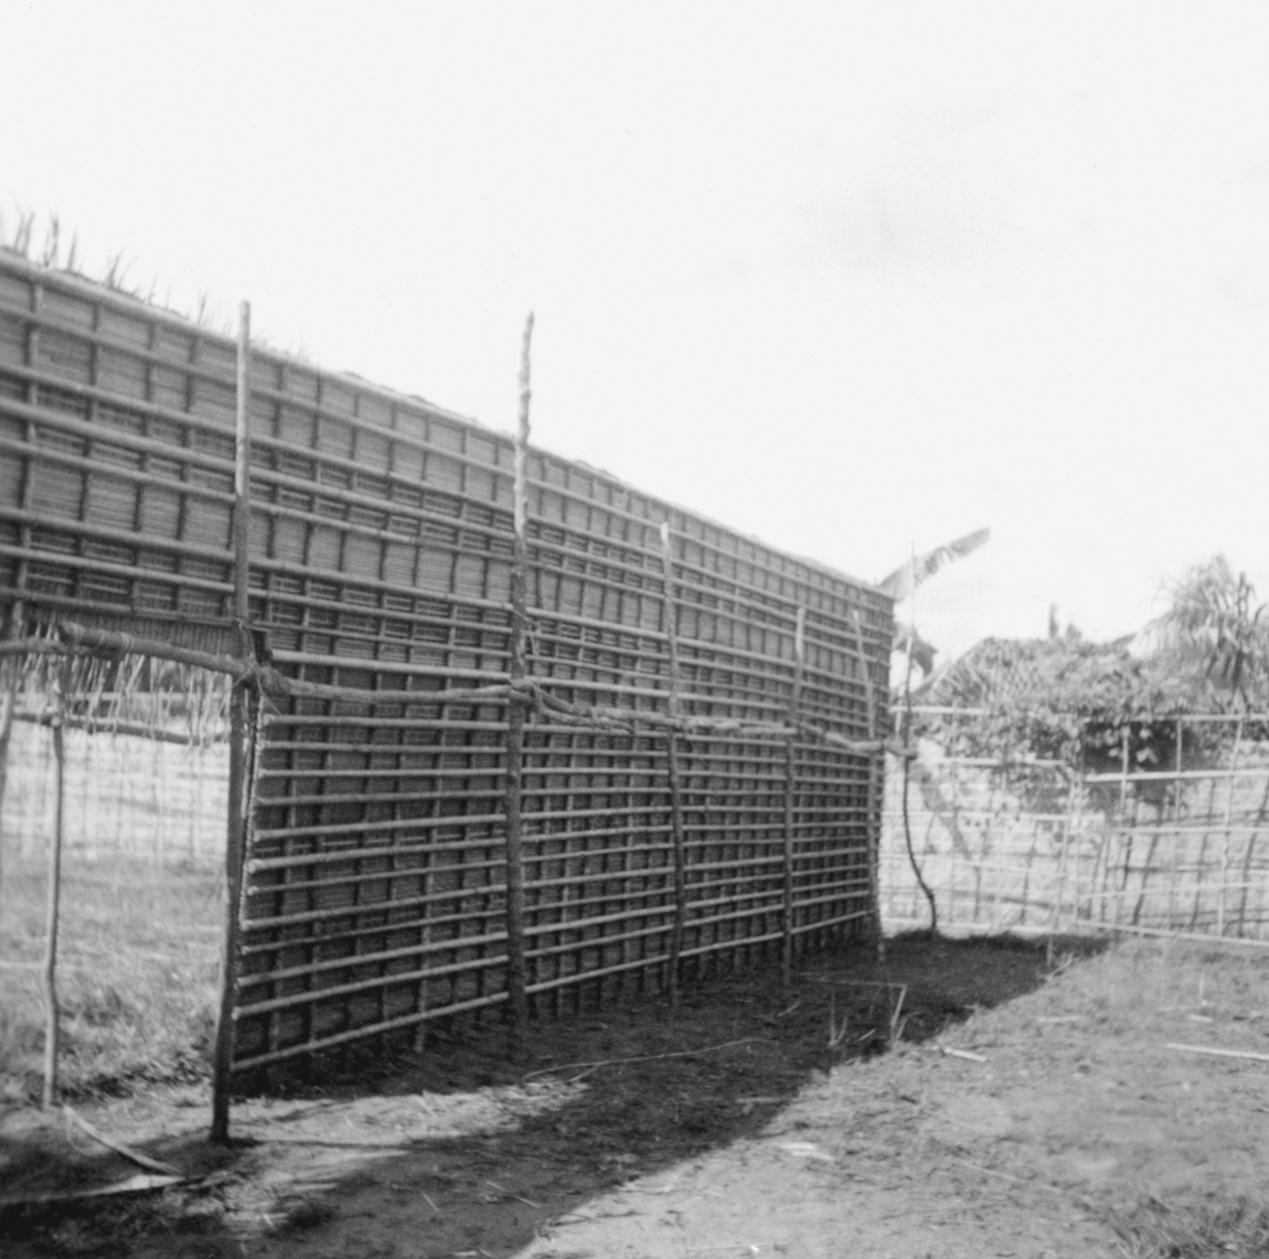 Placement of Prefab Wall for Kuba-Bushong Guardhouse